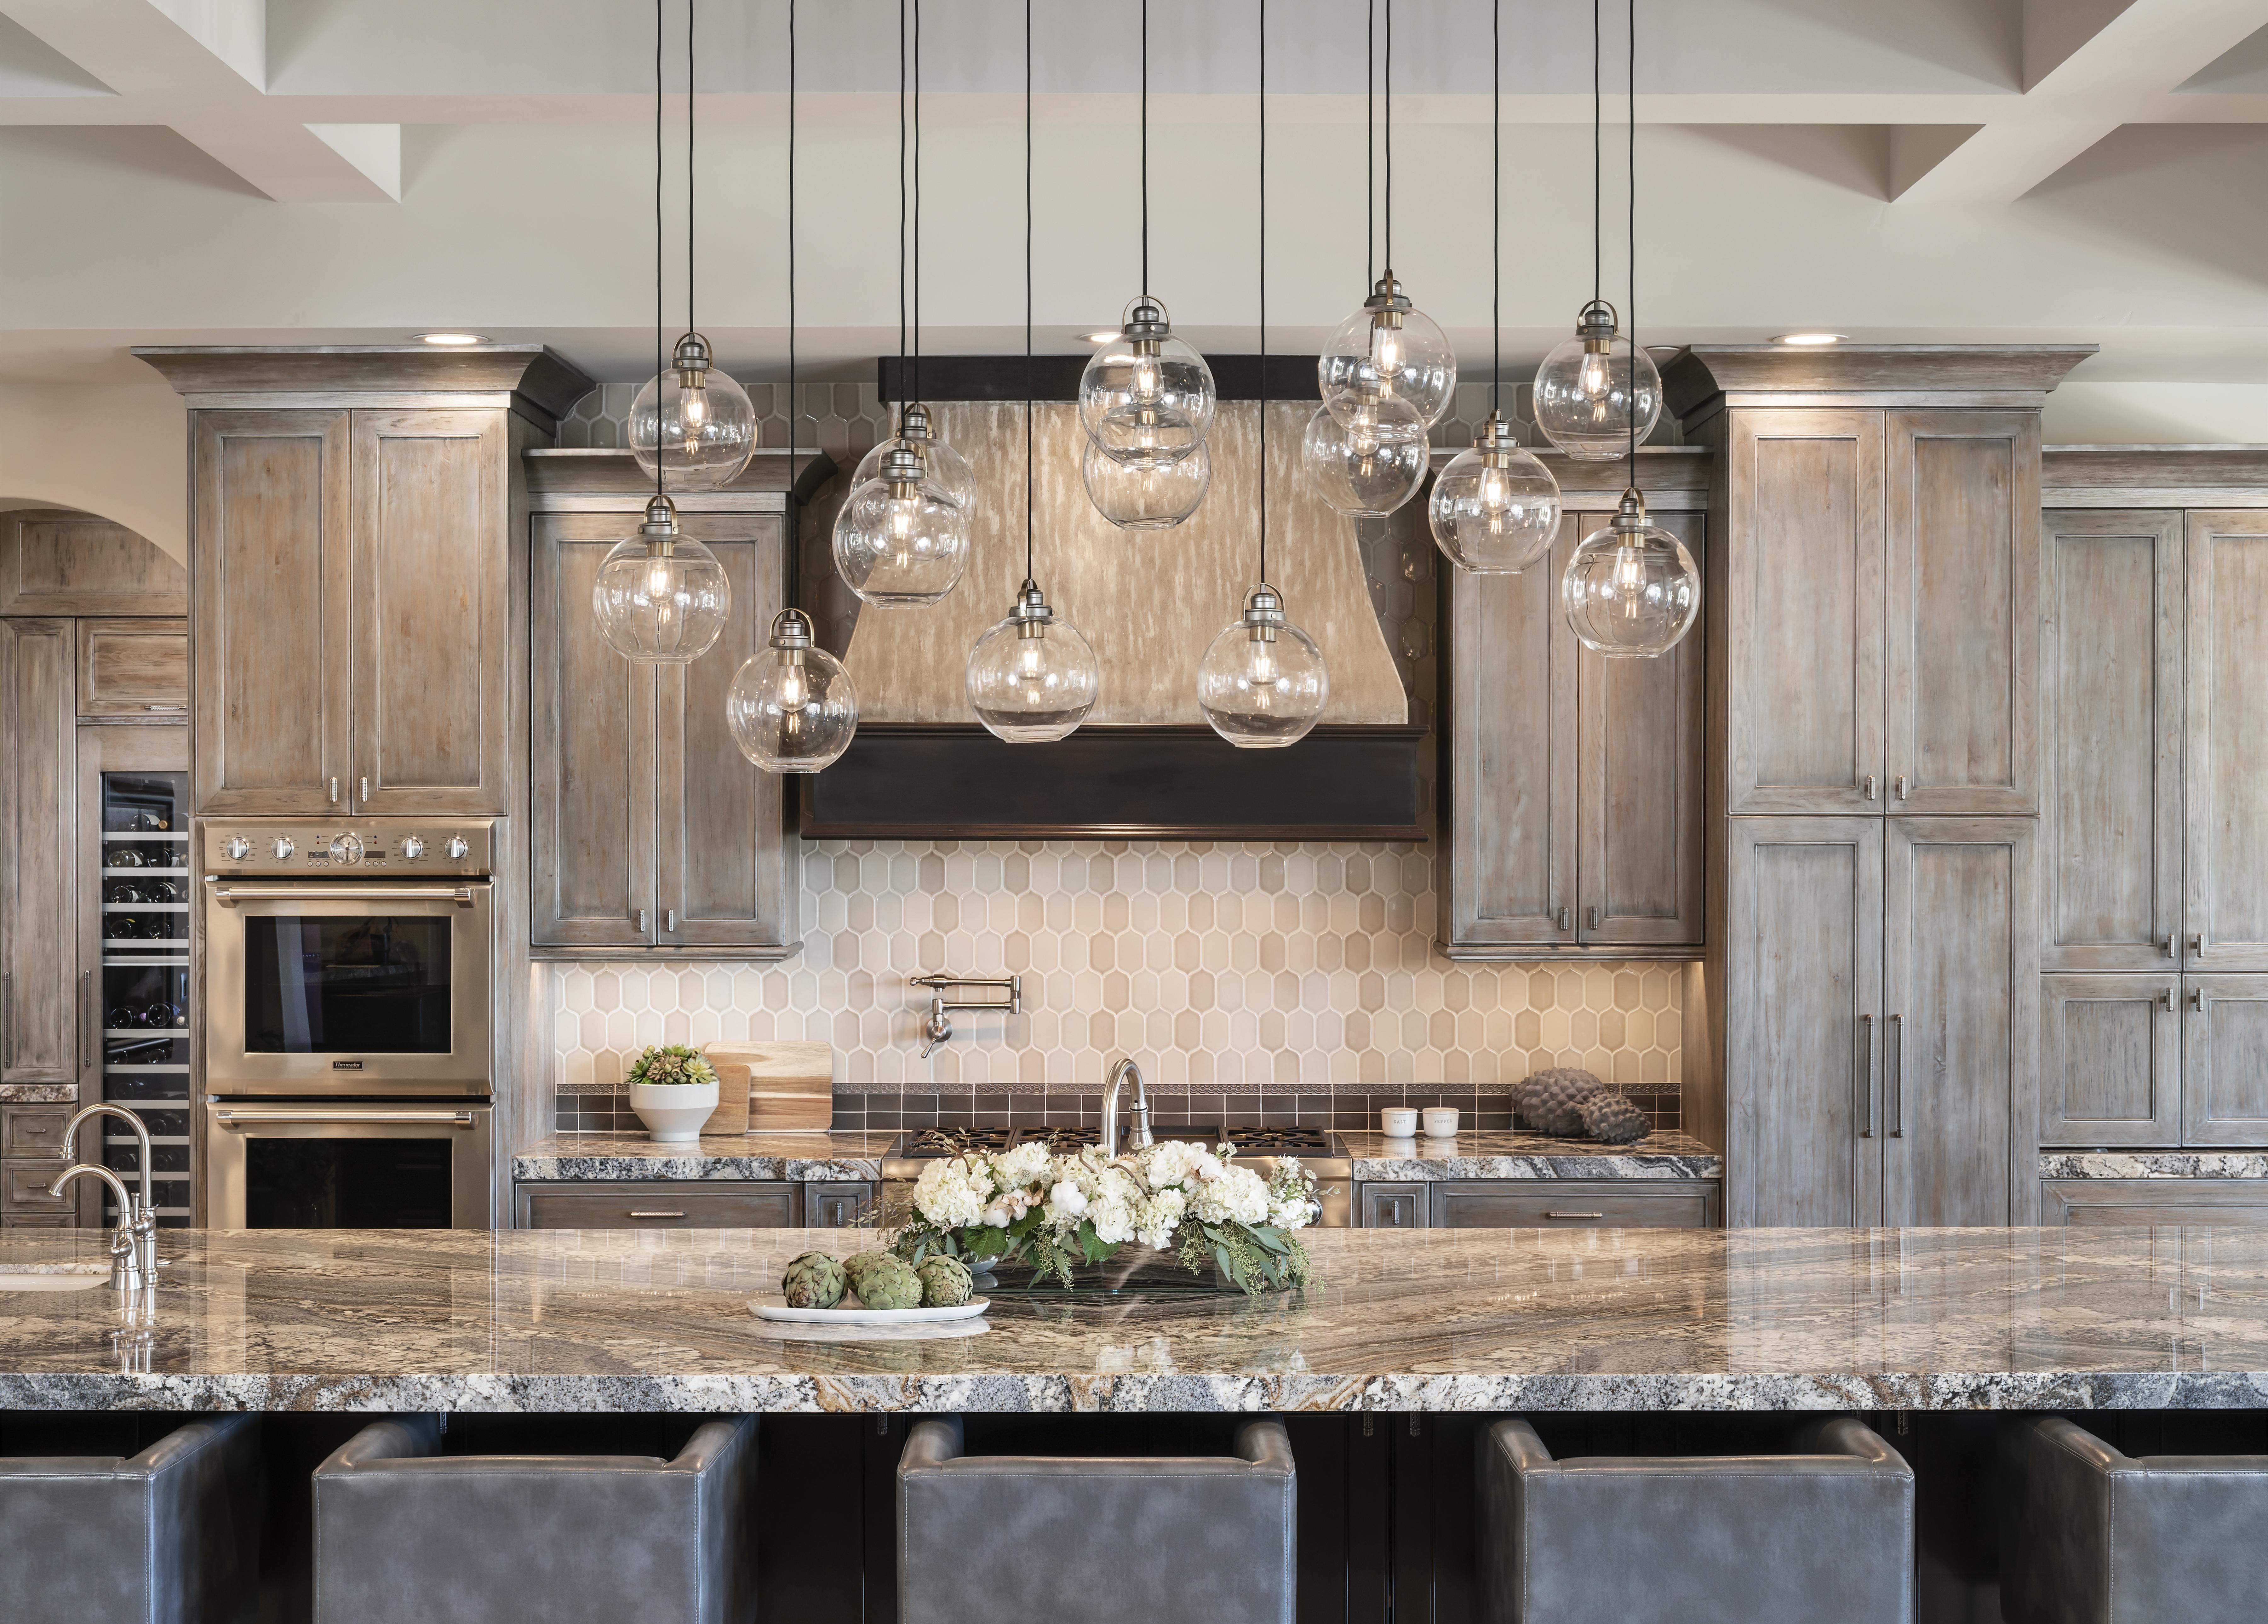 Saddleback Estate Kitchen